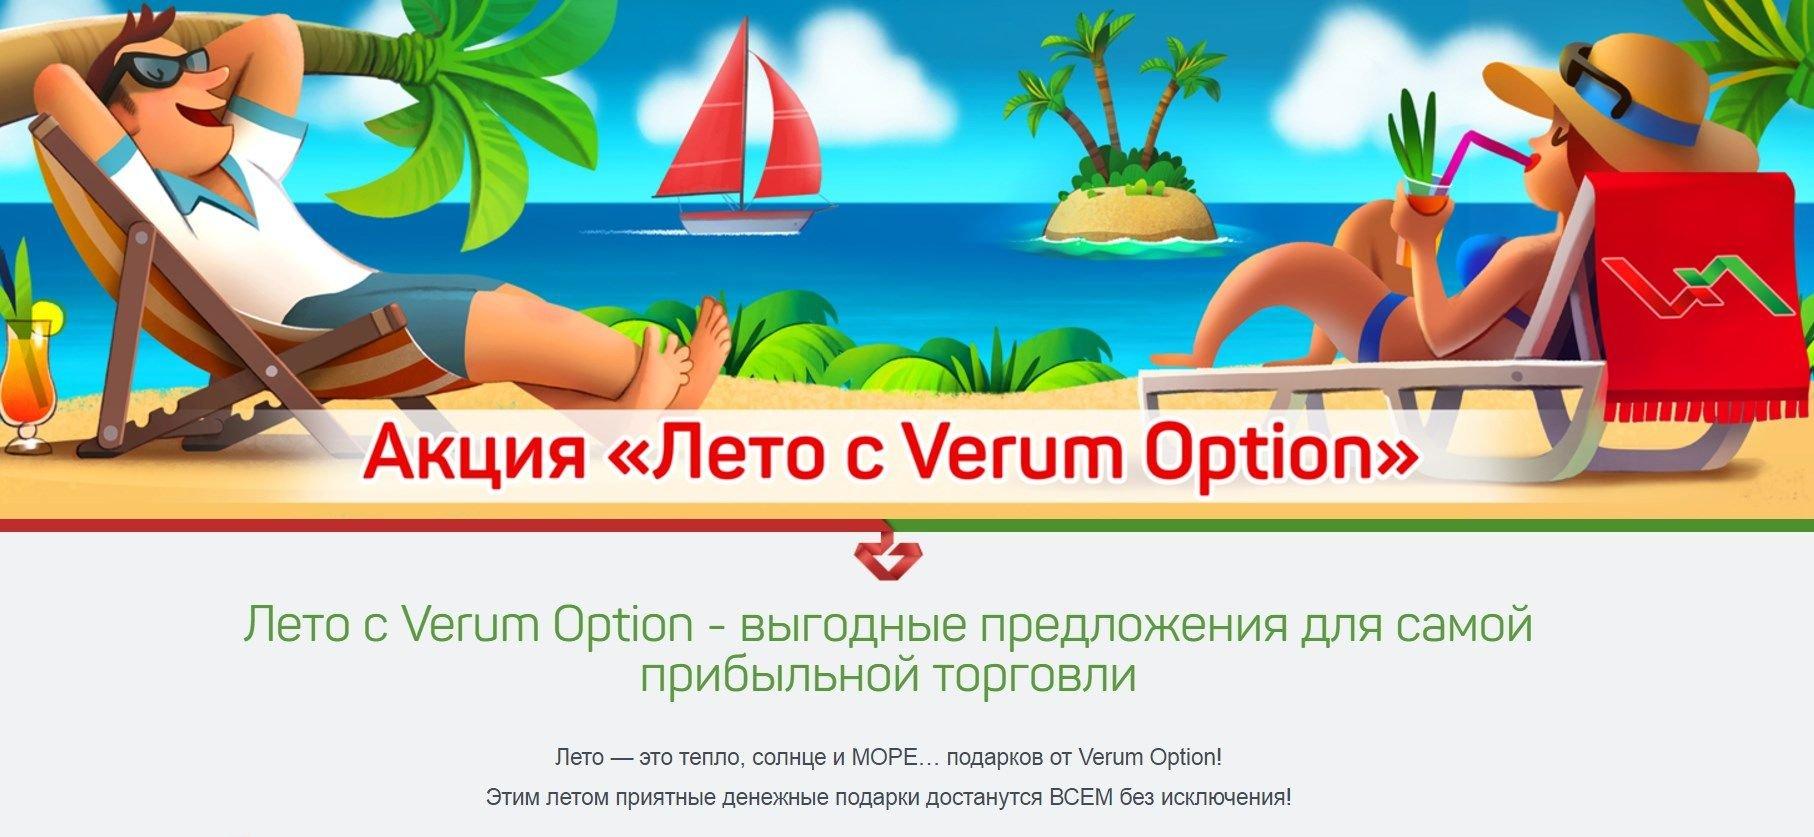 Акция «Лето с Verum Option!»